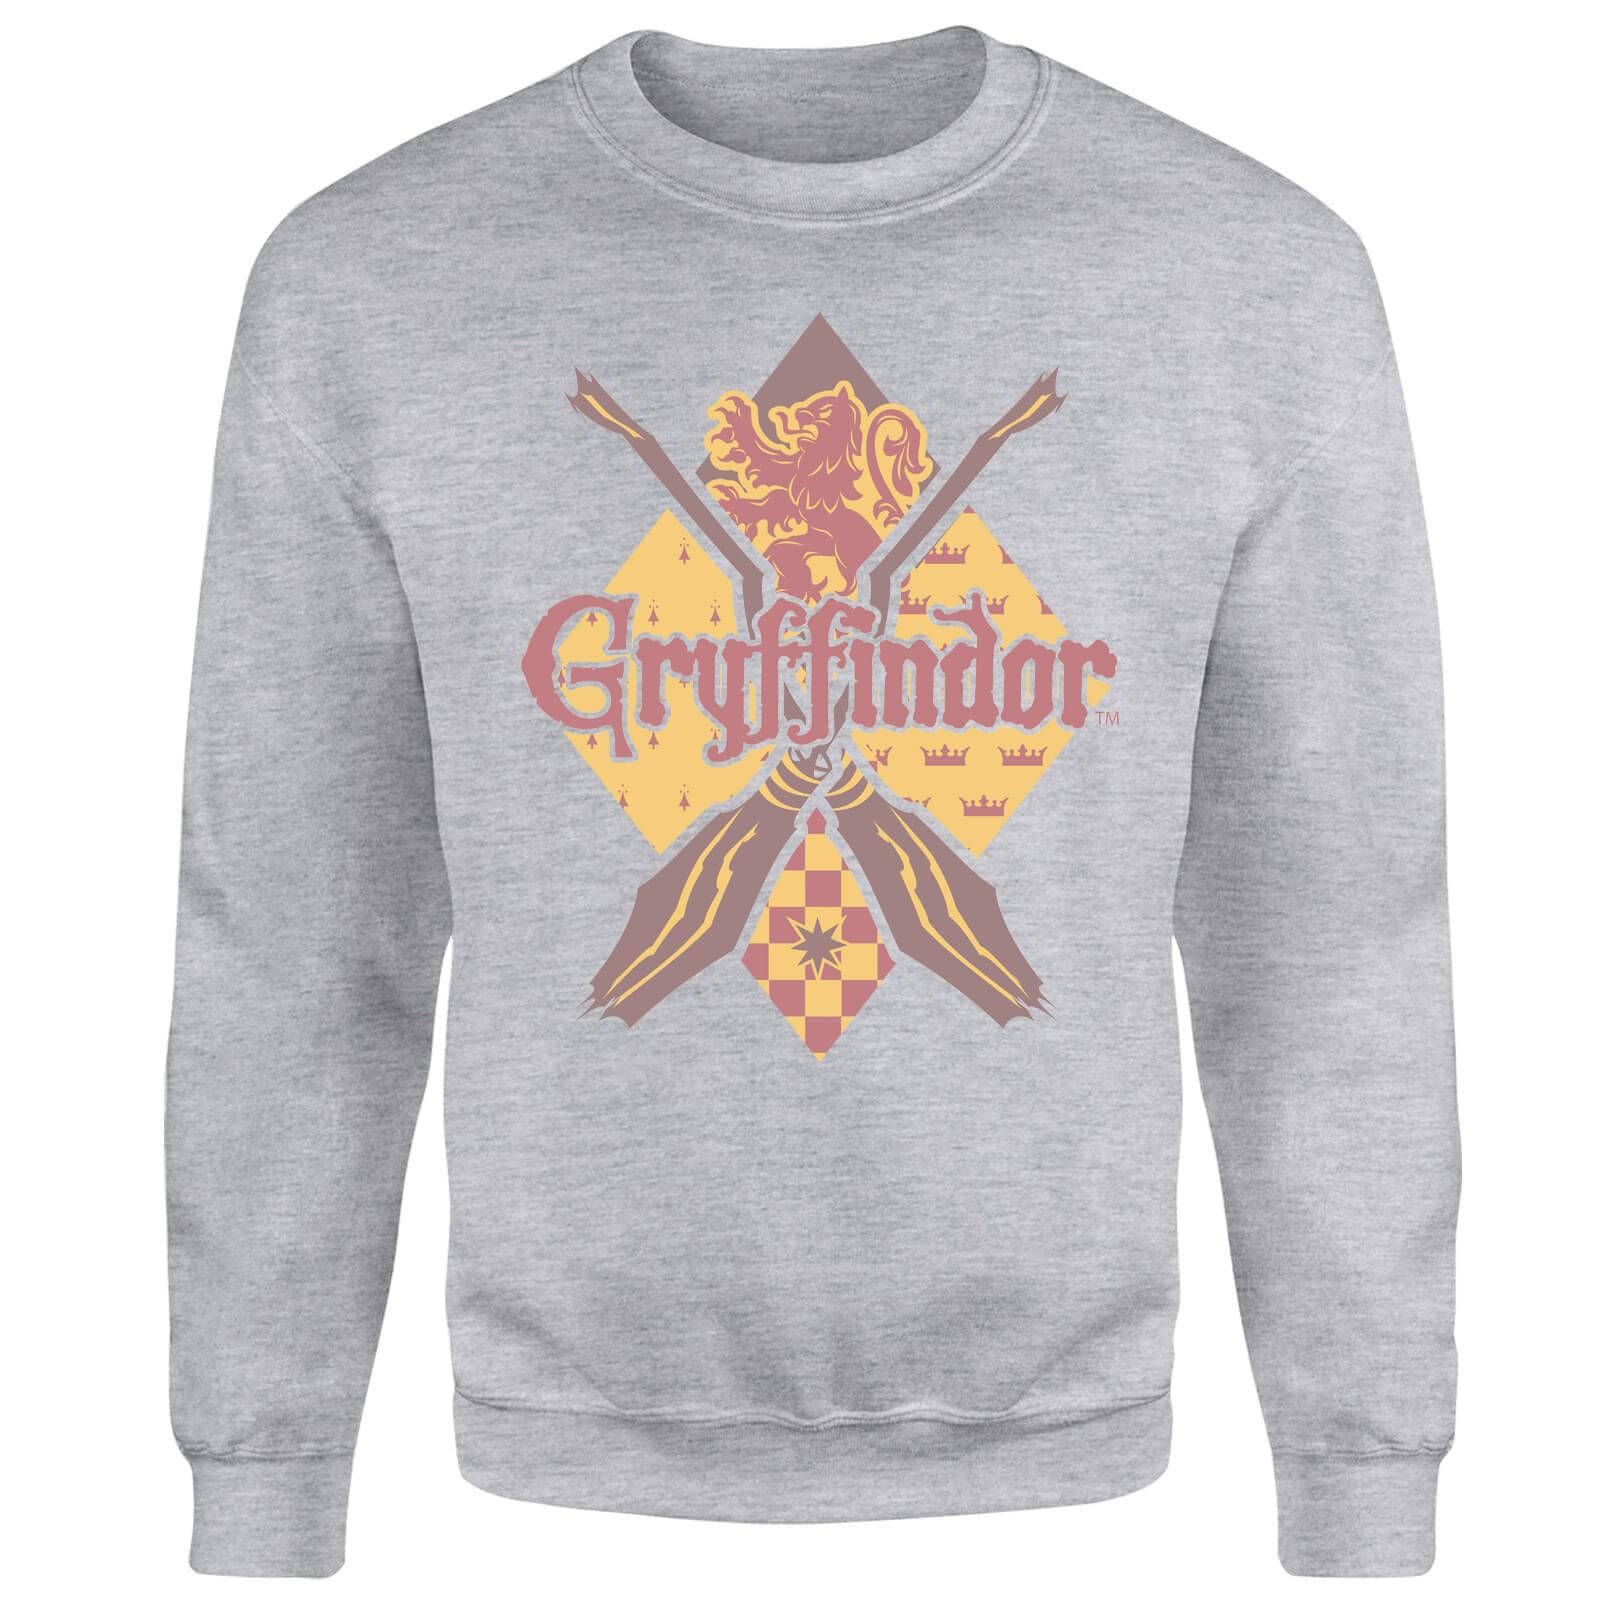 Harry Potter Gryffindor Grey Sweatshirt - S - Grey